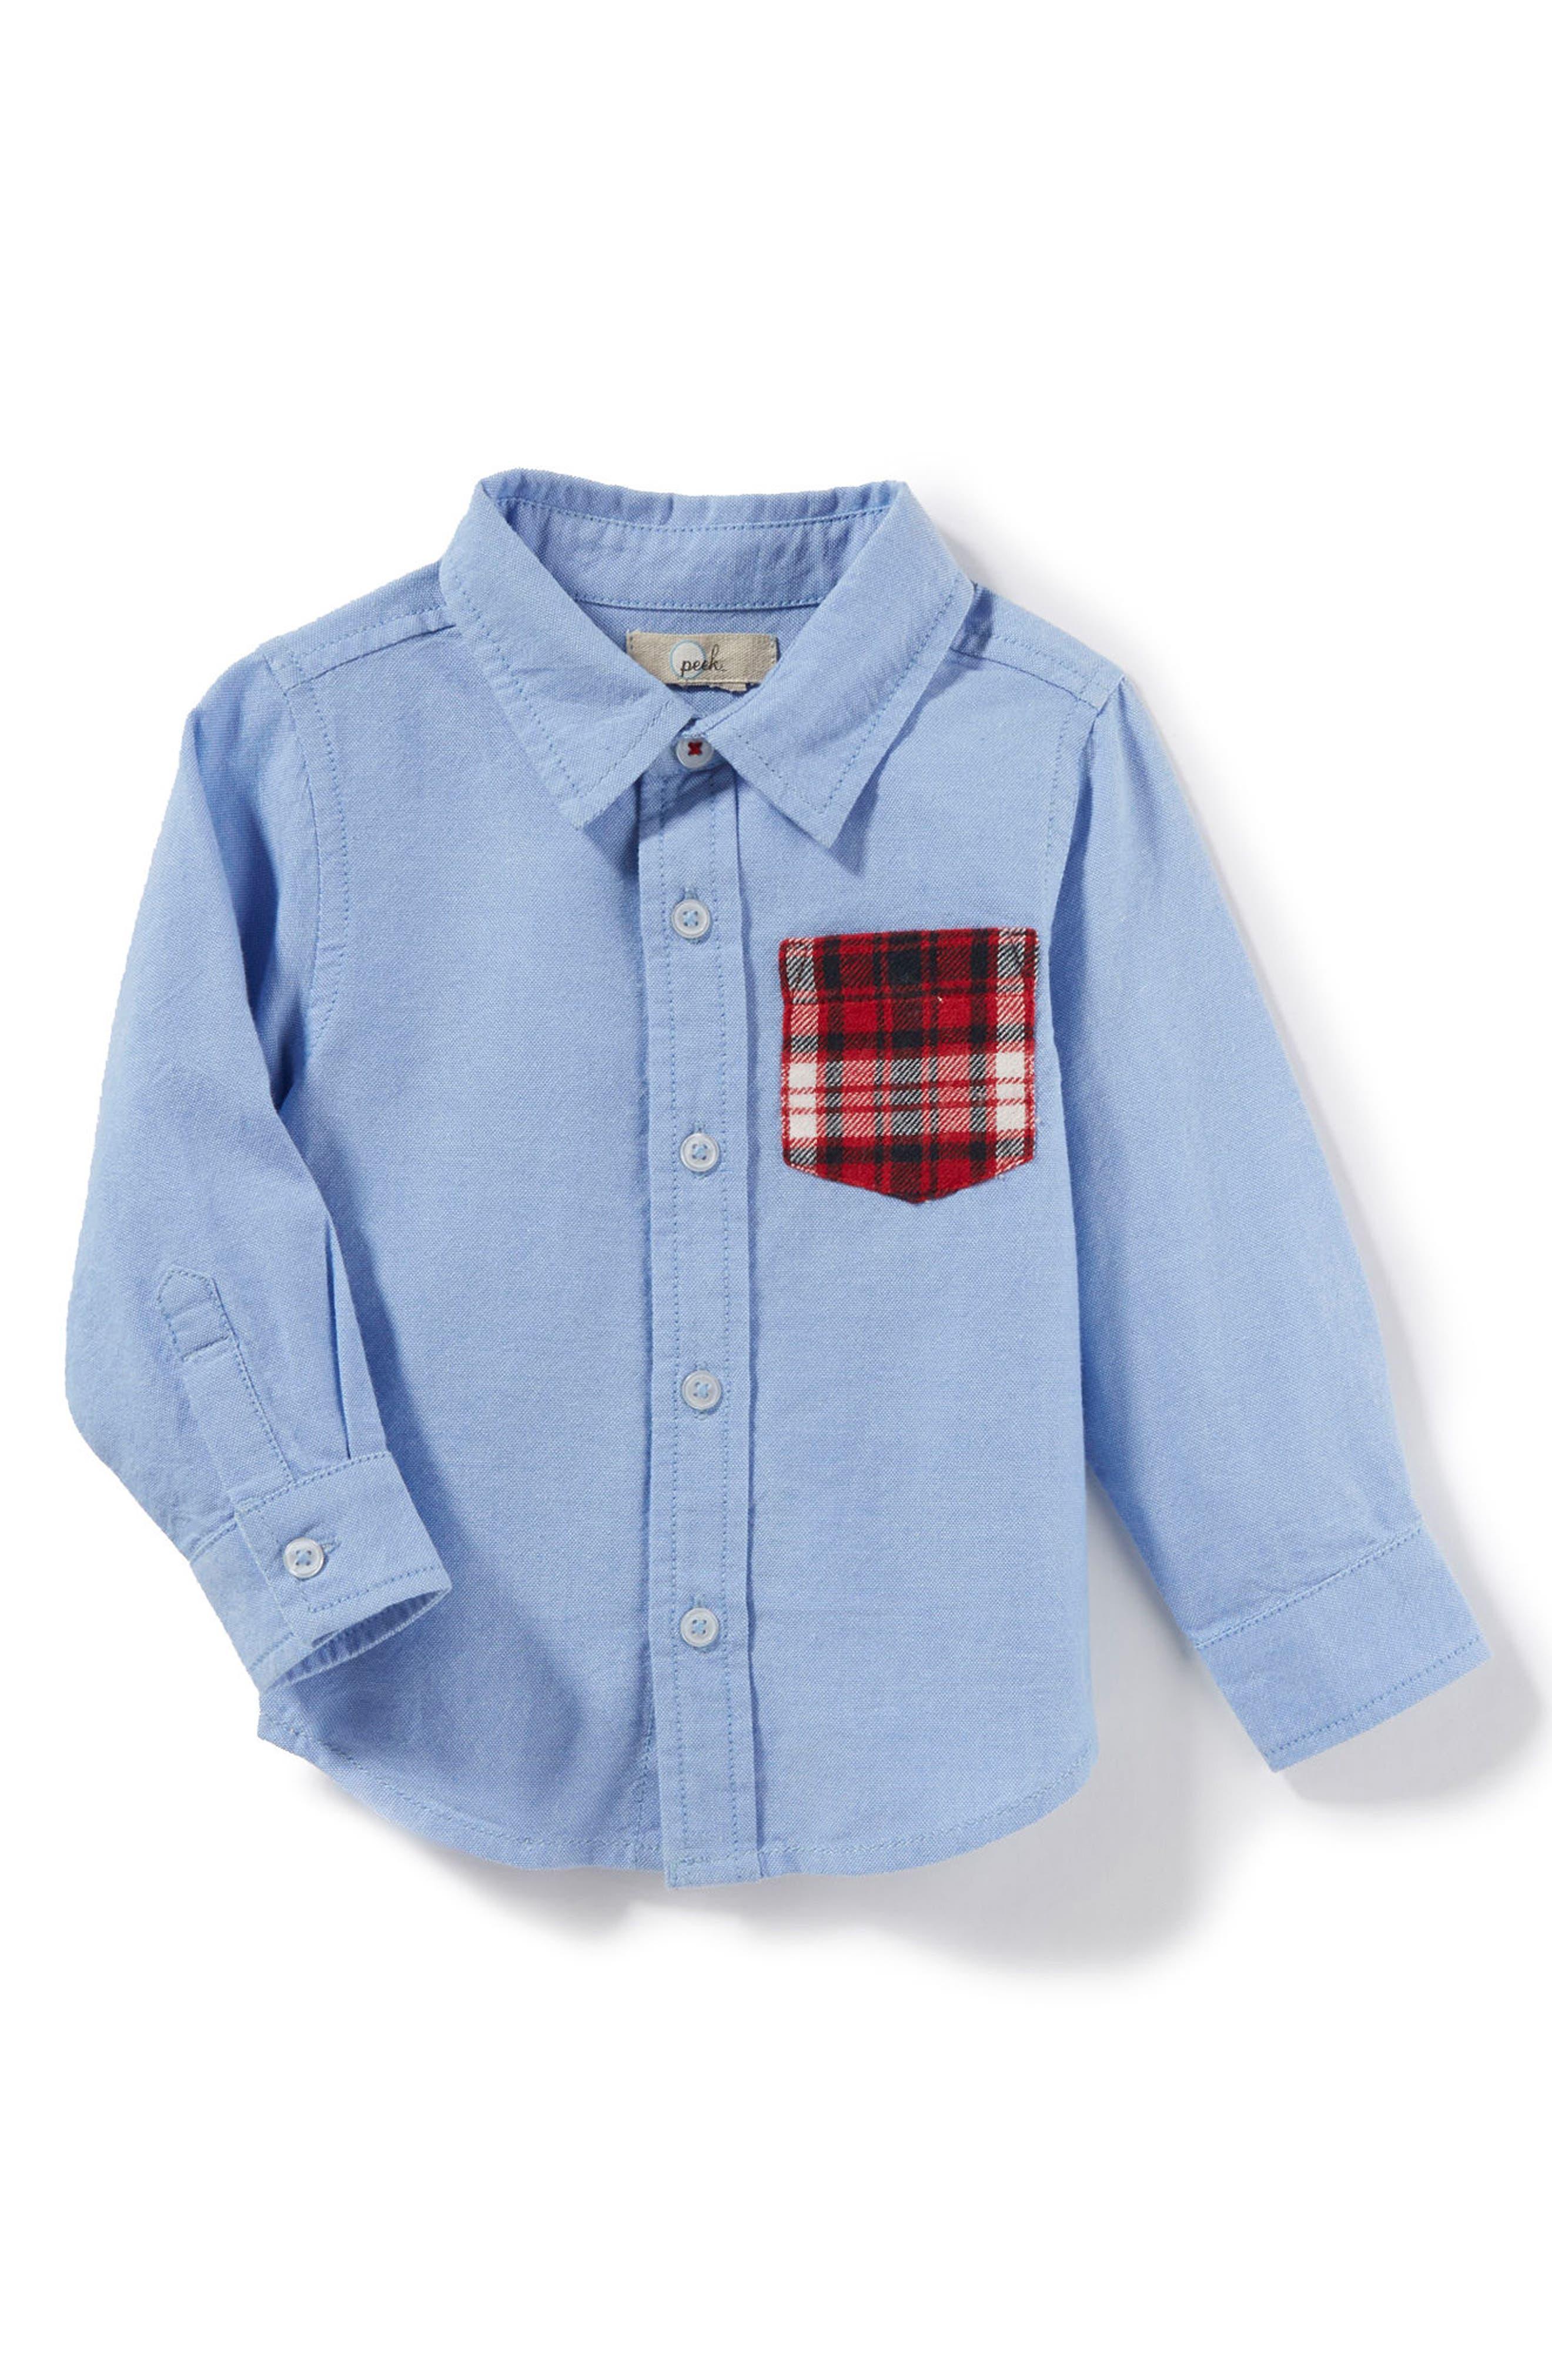 Main Image - Peek Johnny Oxford Shirt (Baby Boys)